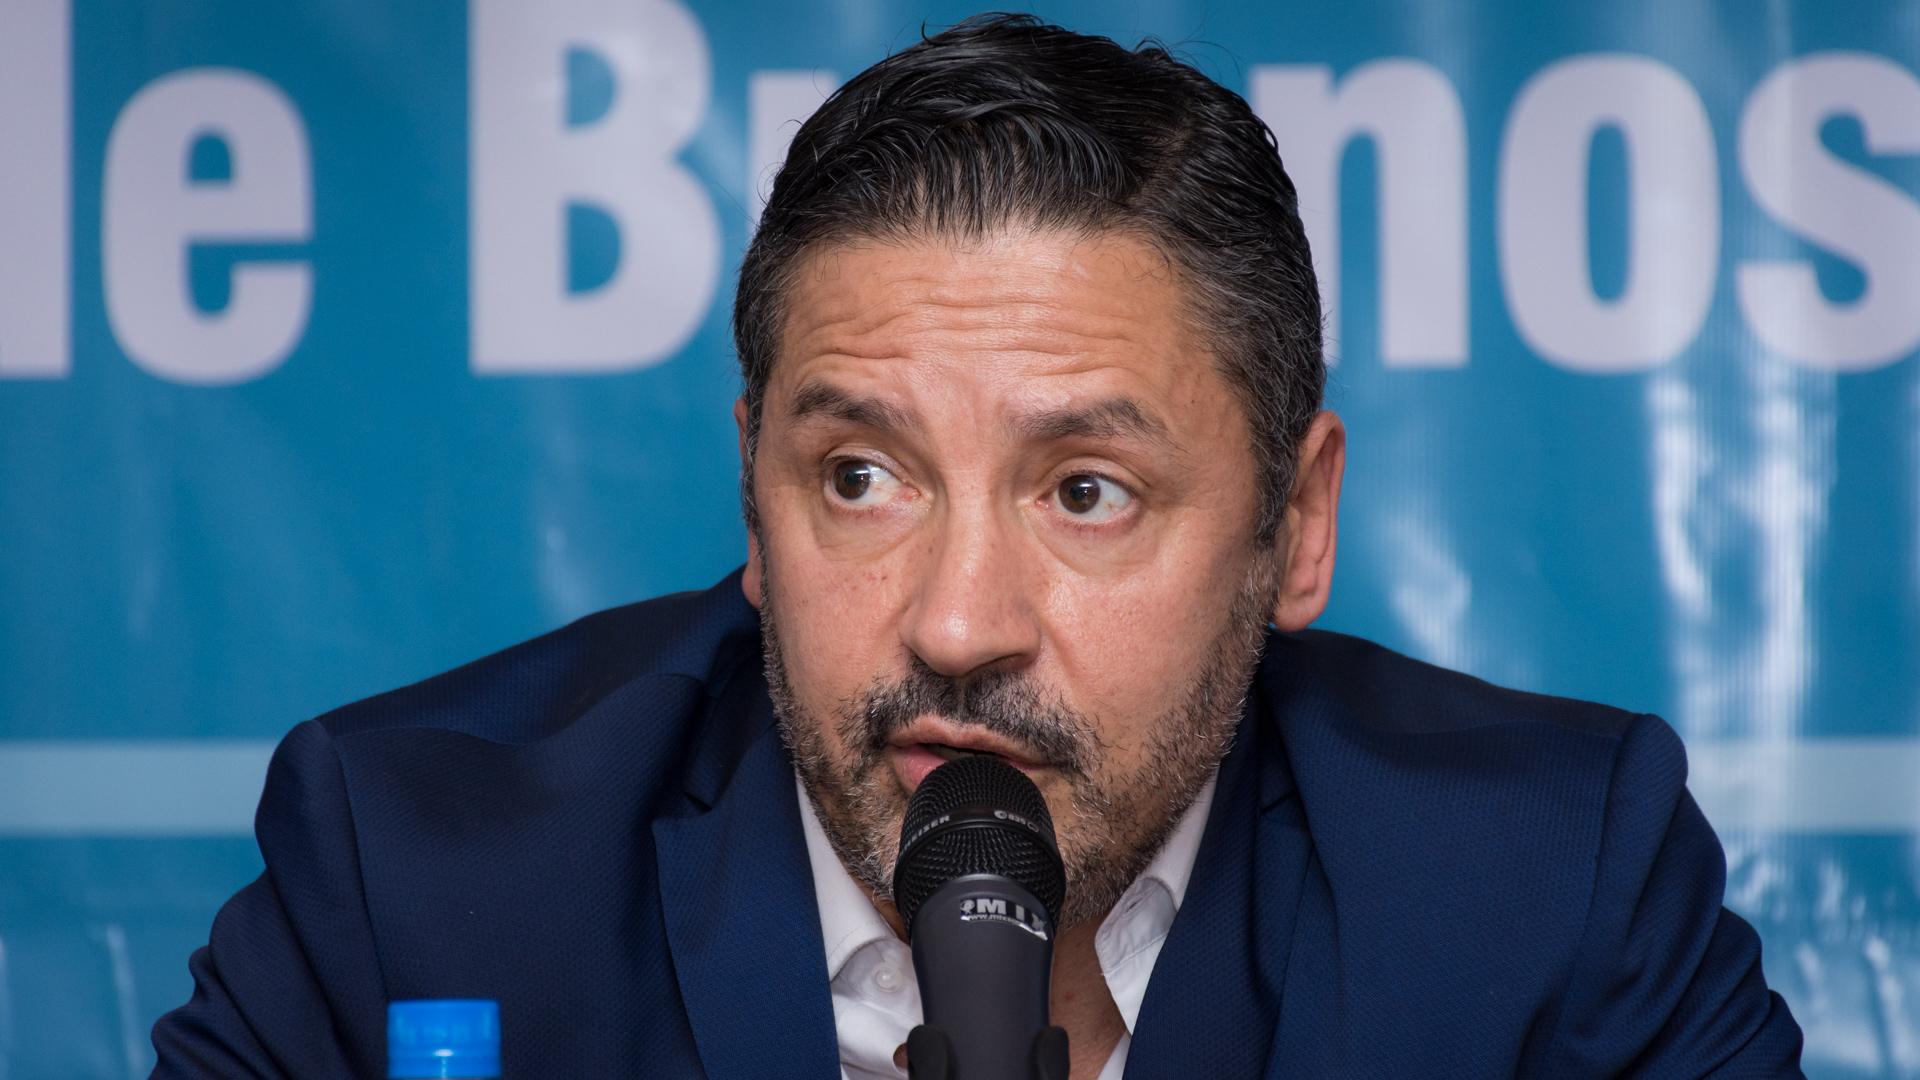 El presidente del PJ Bonaerense, Gustavo Menéndez (Martín Rosenzveig)